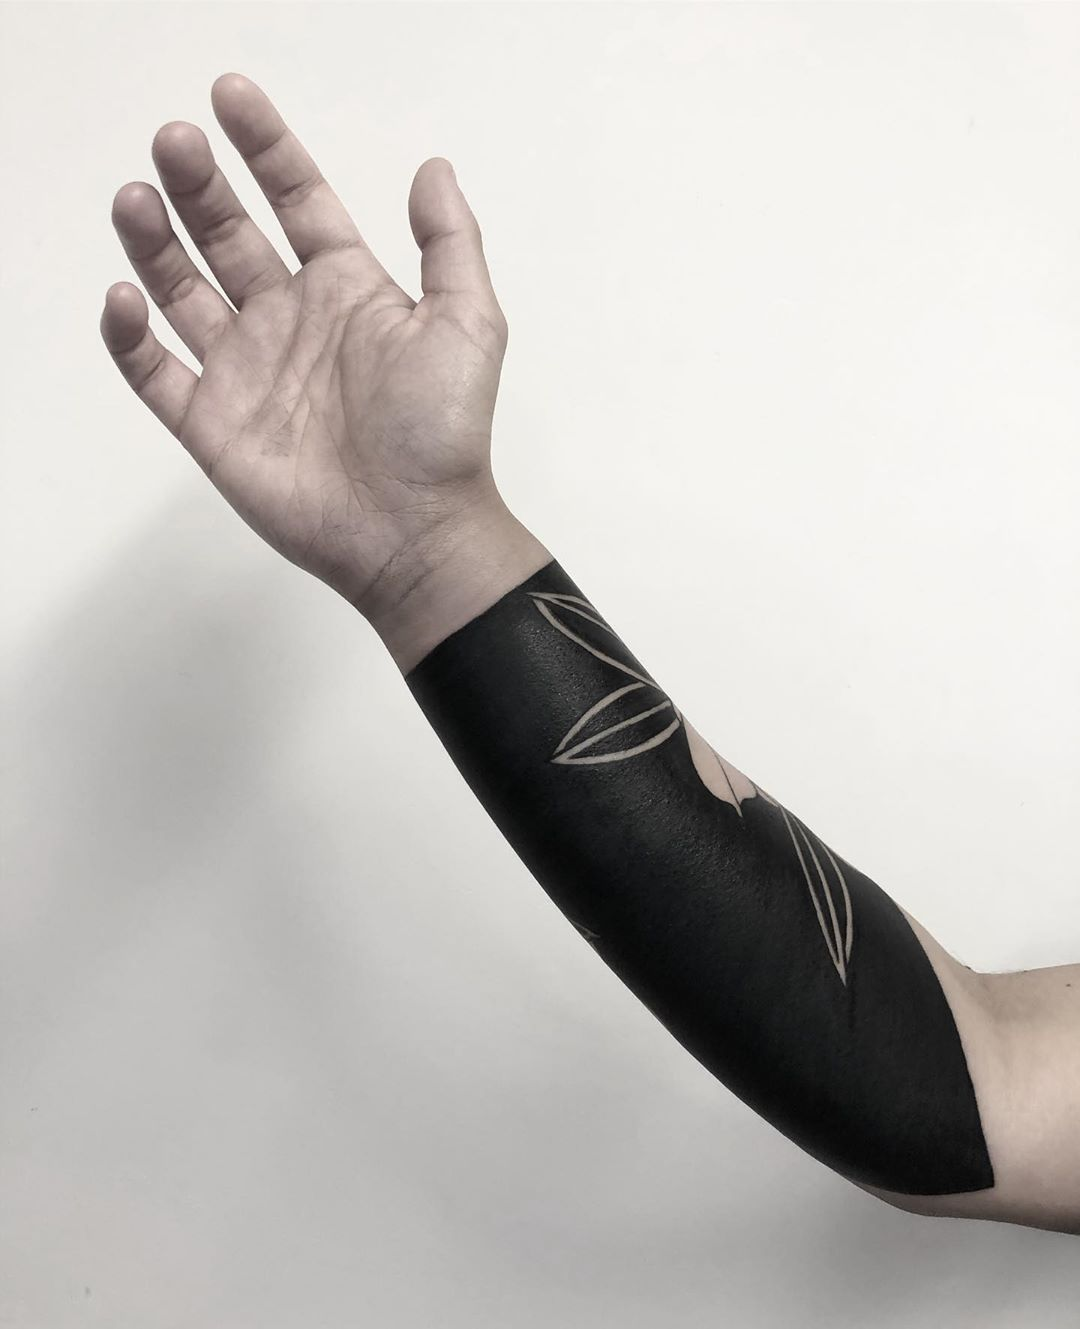 Negative-space forearm by Koldo Novella